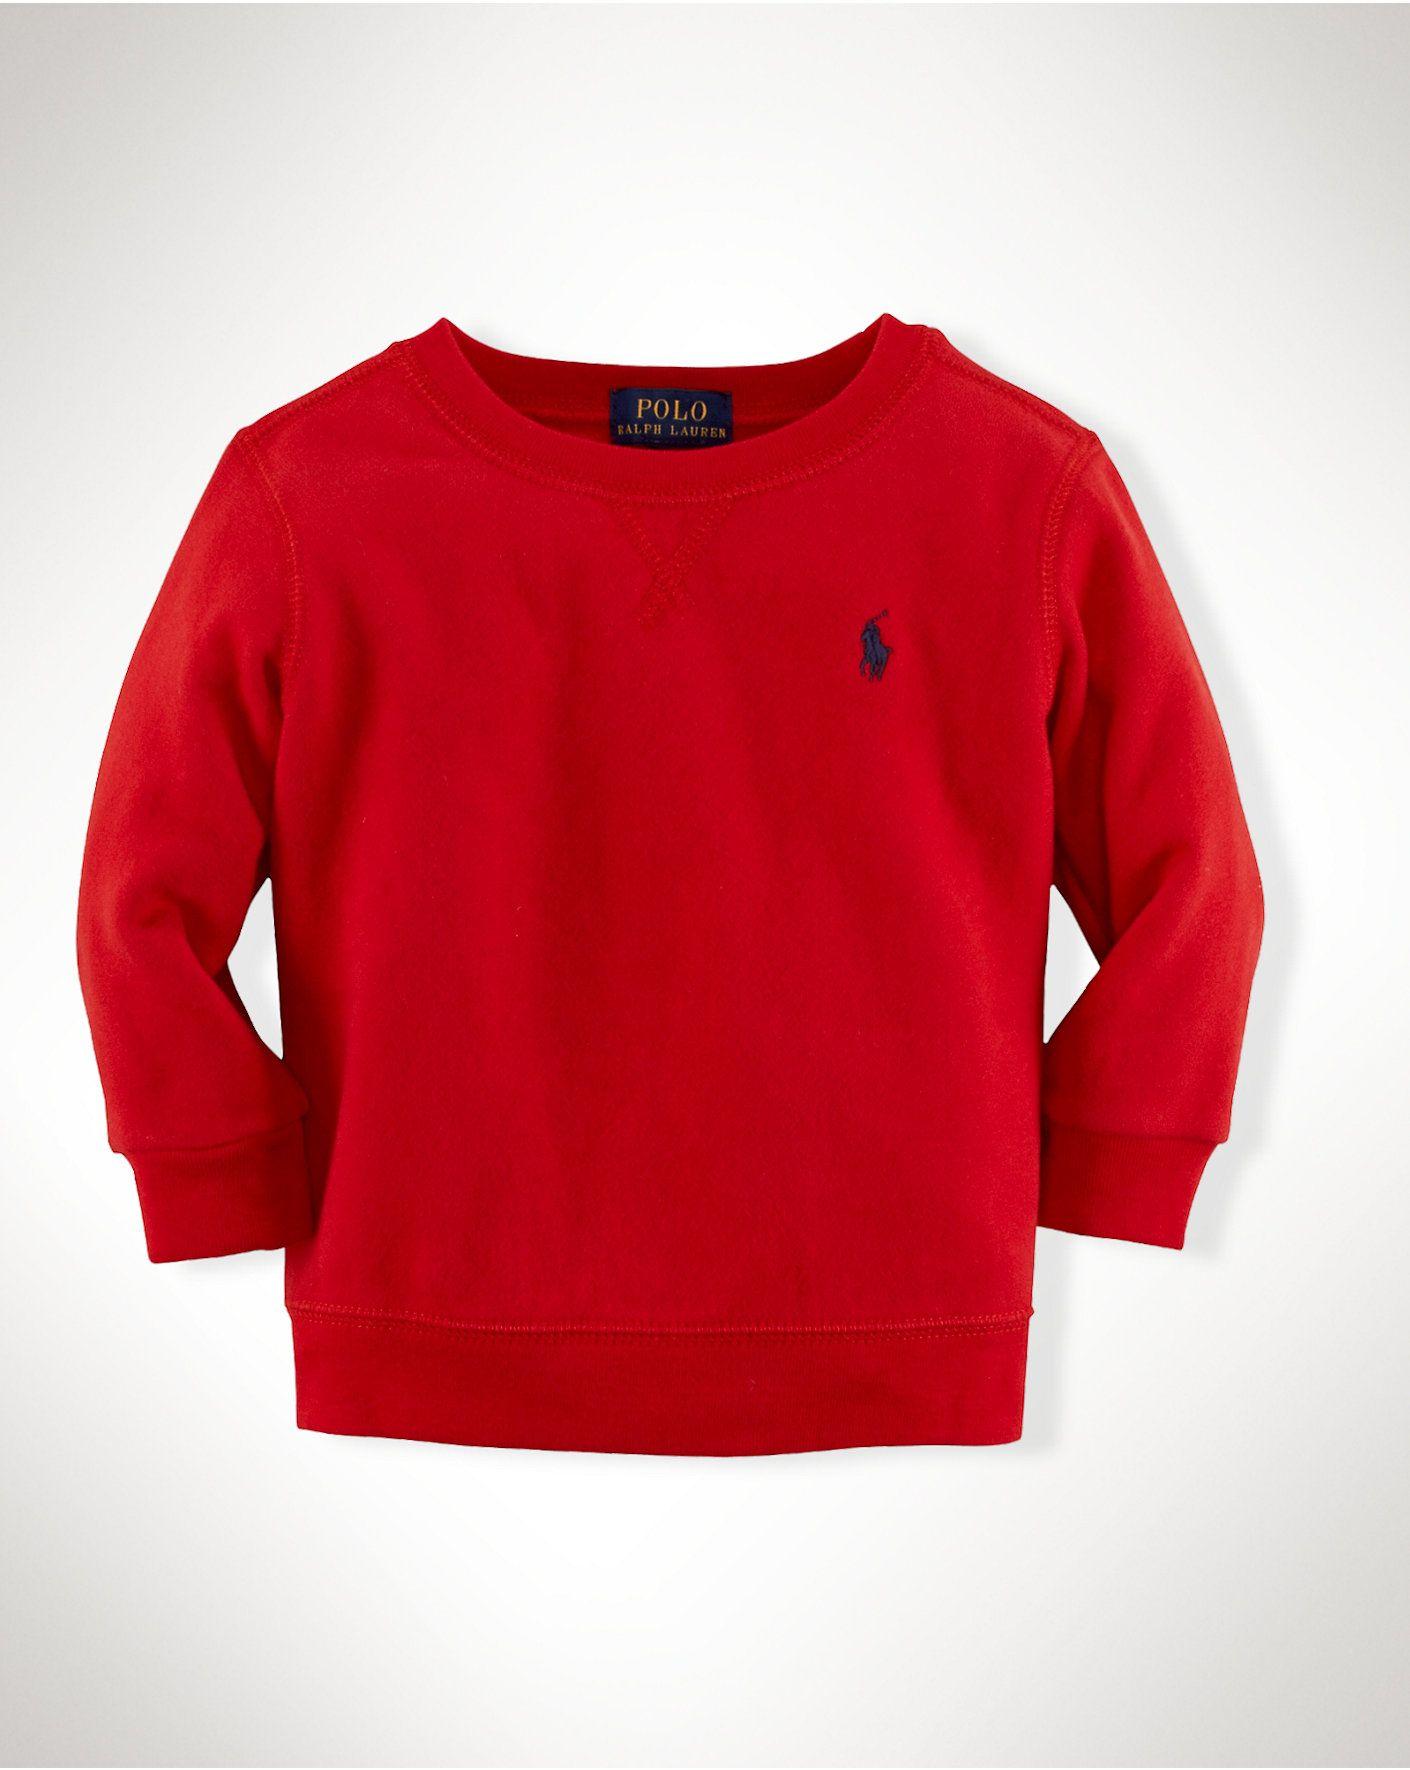 Cotton Fleece Pullover - Sweatshirts  Infant Boy (9M–24M) - RalphLauren.com